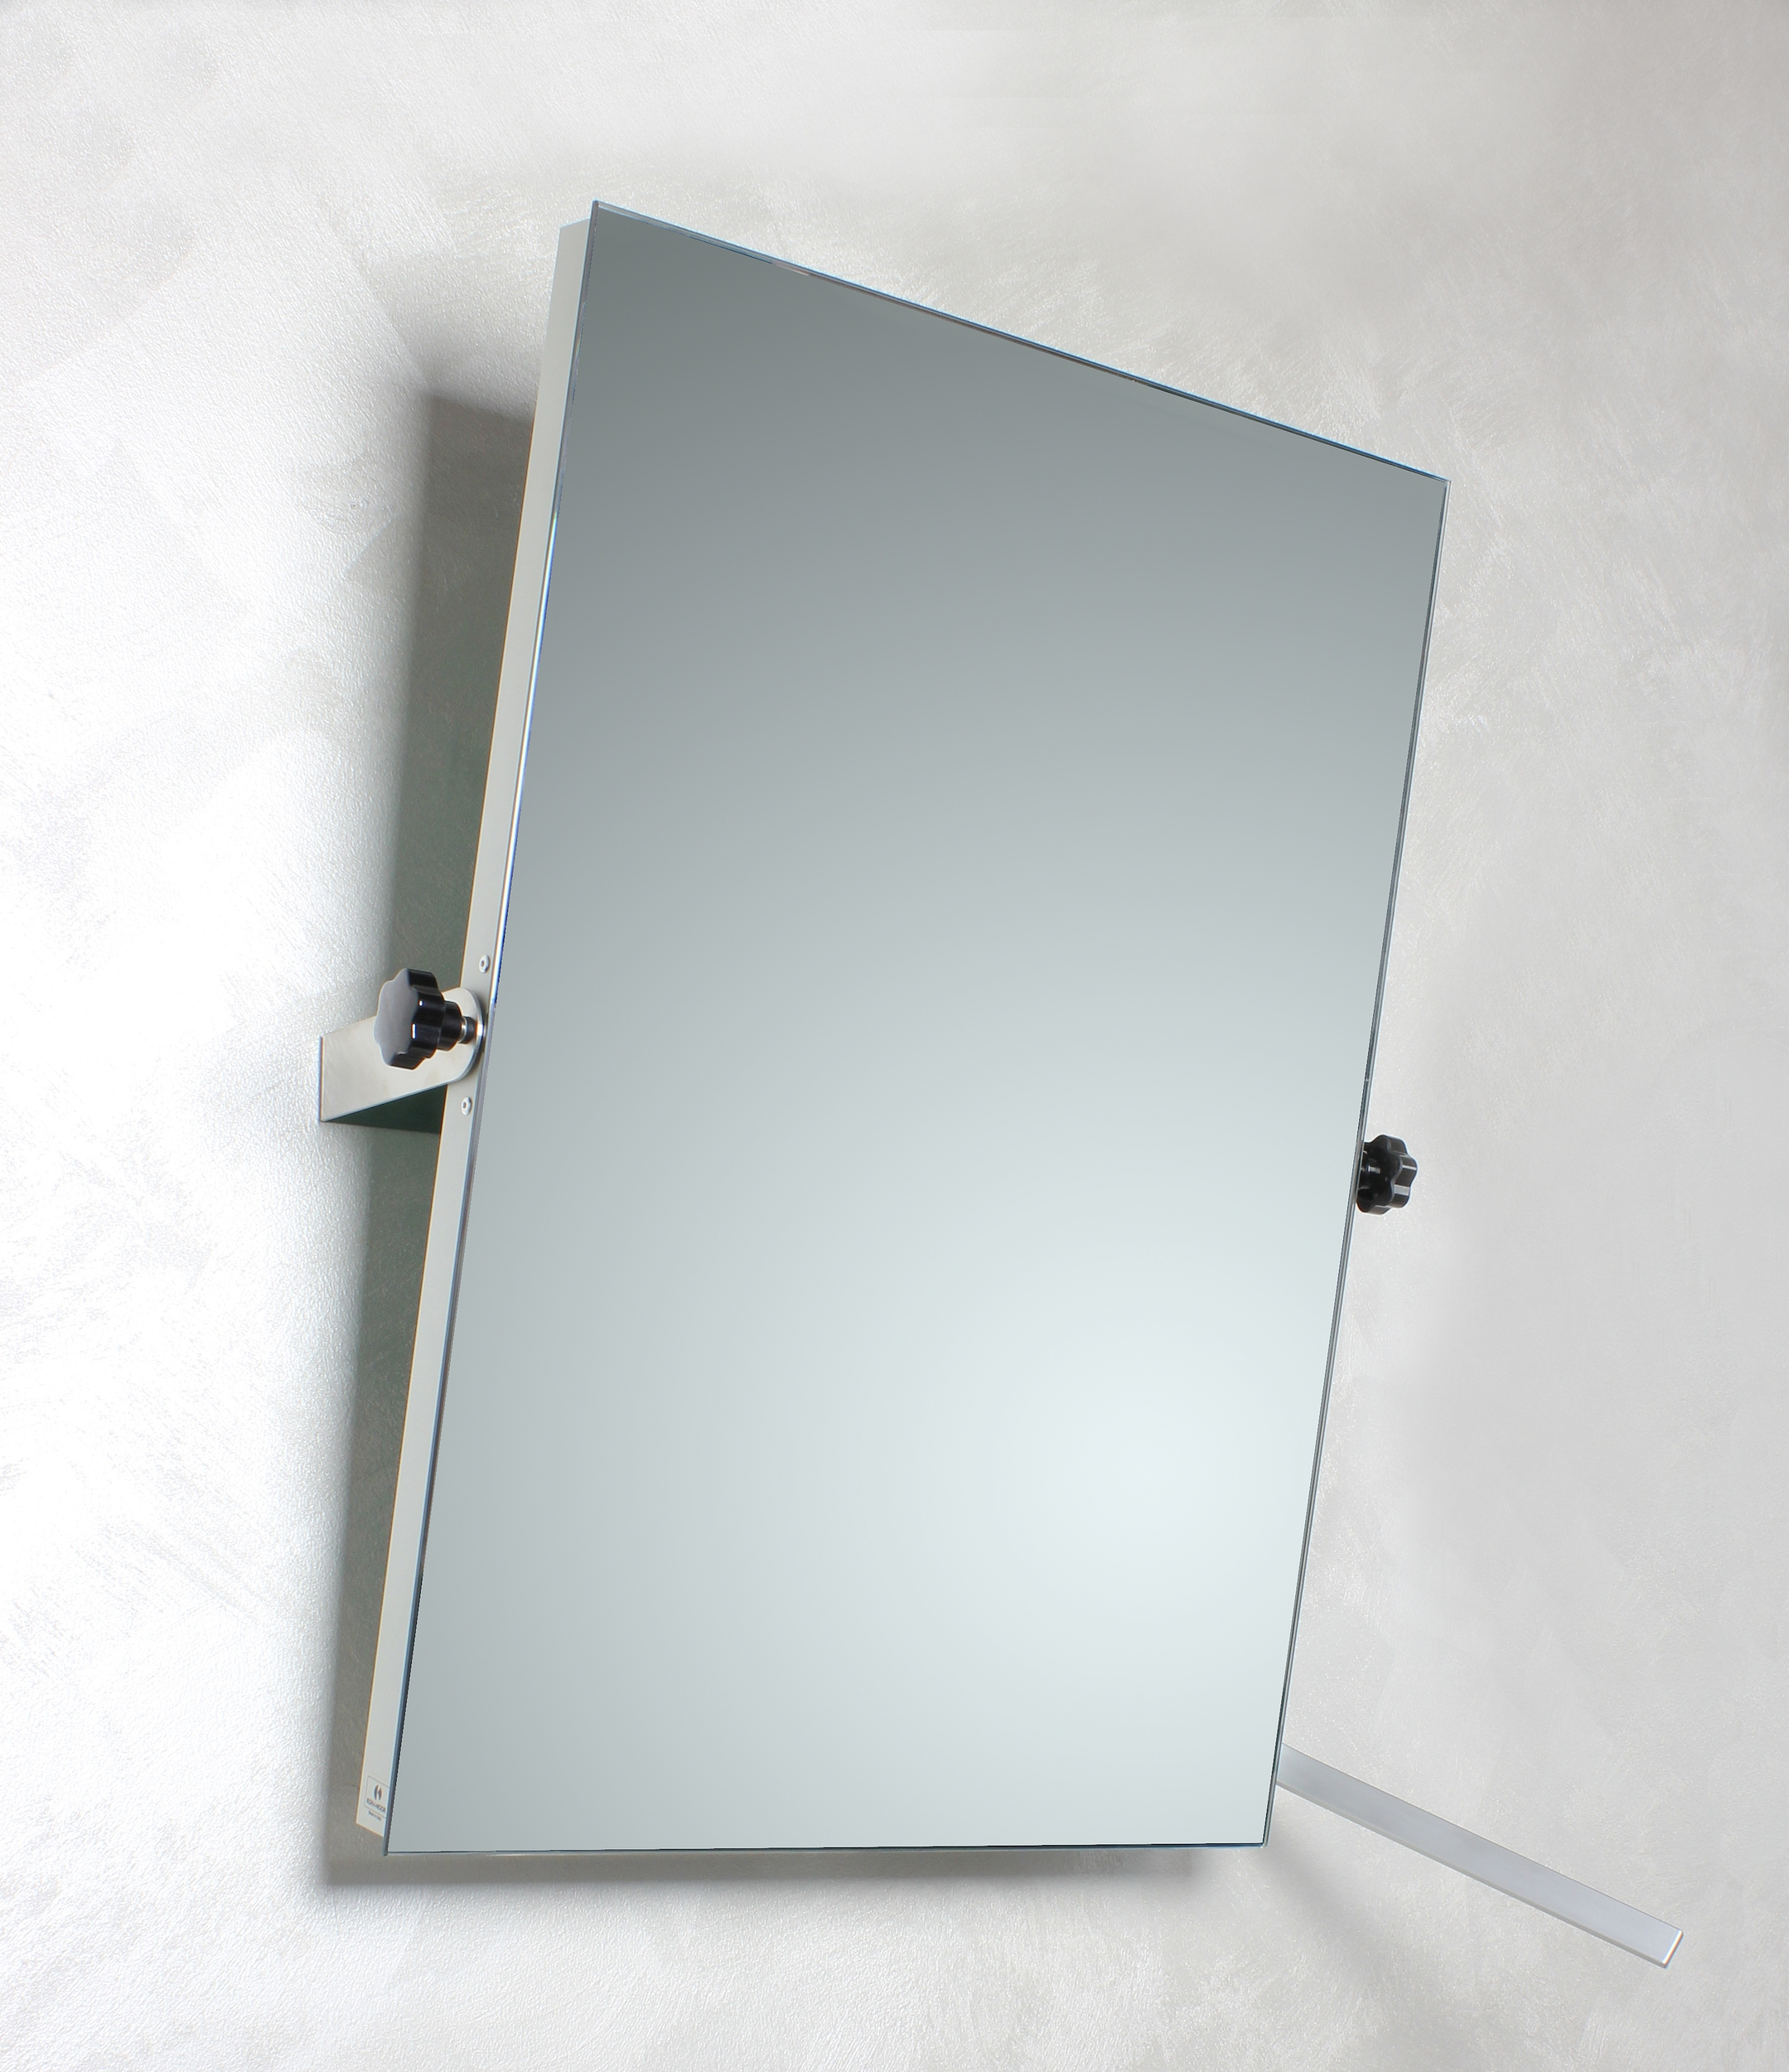 koh i noor specchio inclinabile behindertengerechter. Black Bedroom Furniture Sets. Home Design Ideas